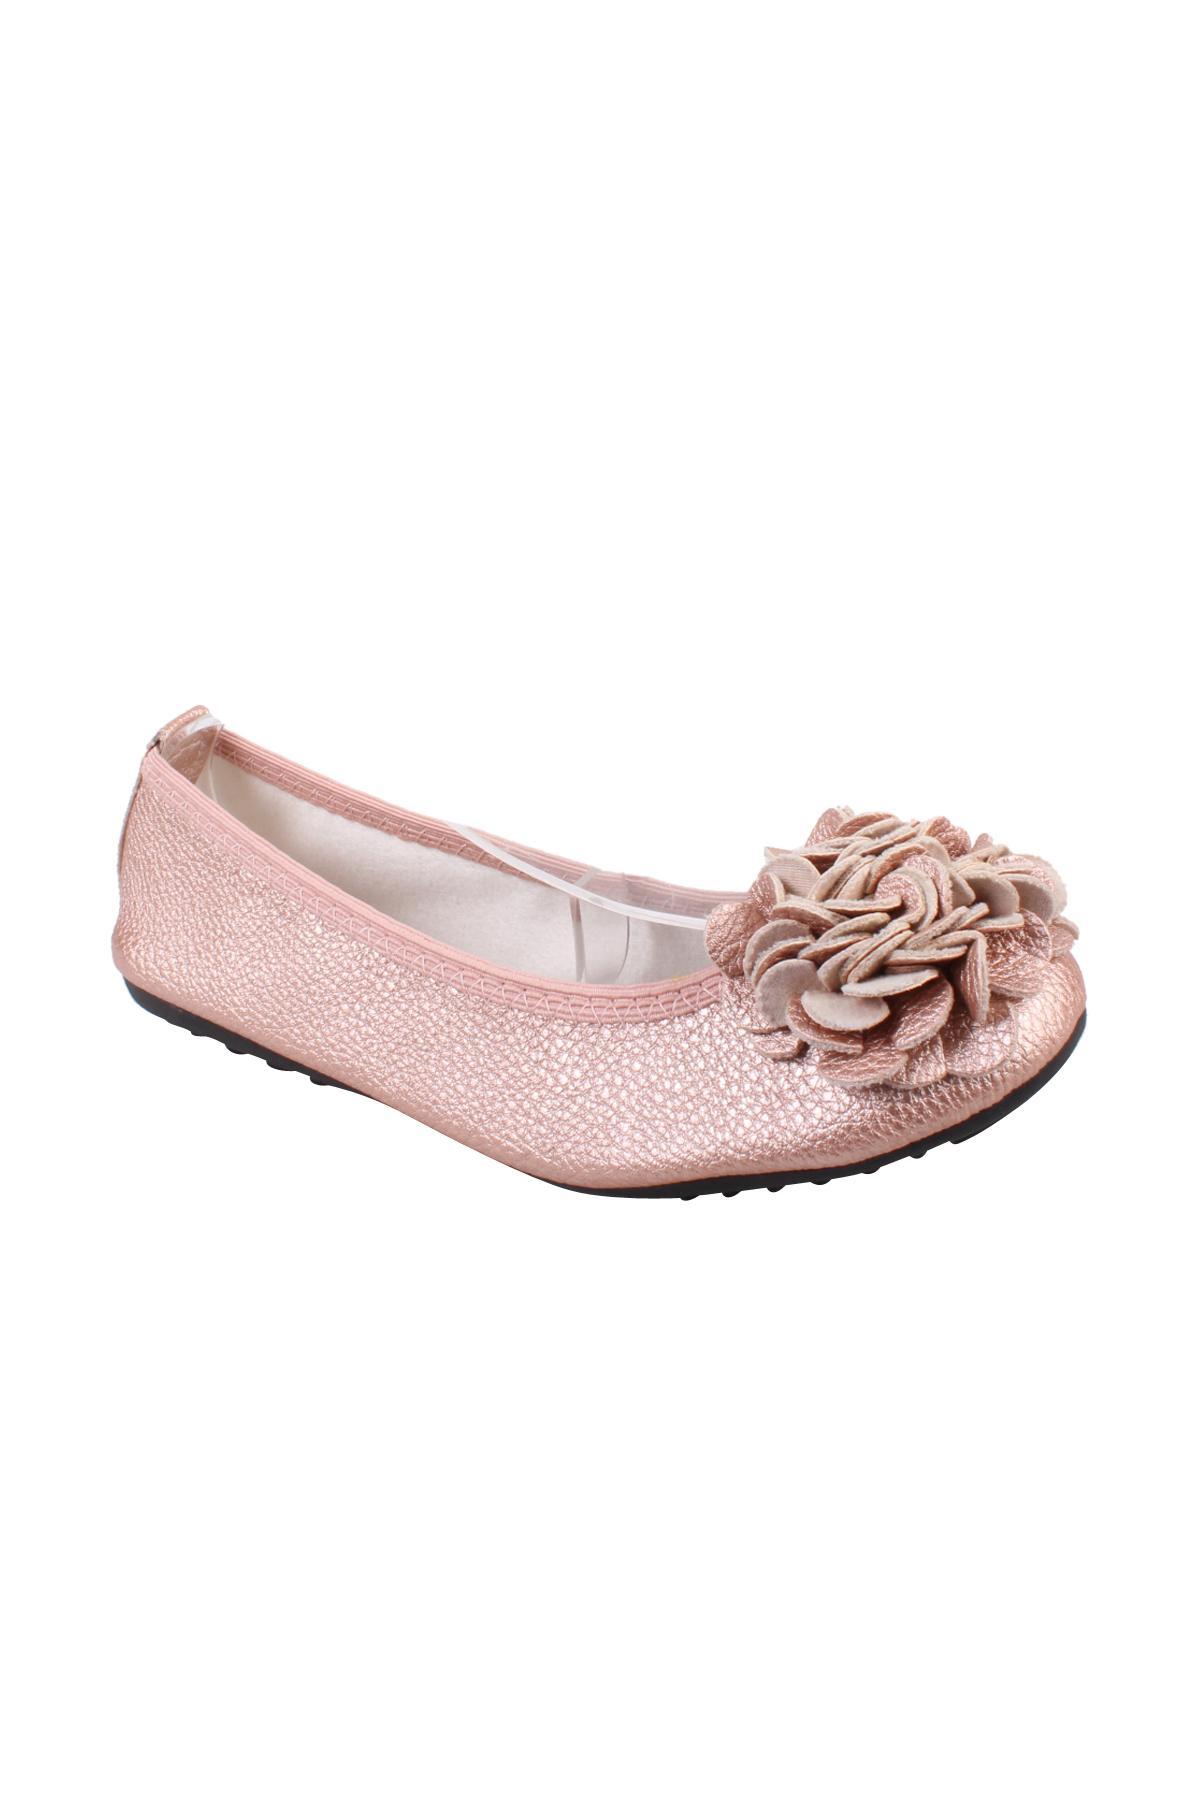 Chaussures filles Chaussures Rose EMELLA C201-KID #c eFashion Paris